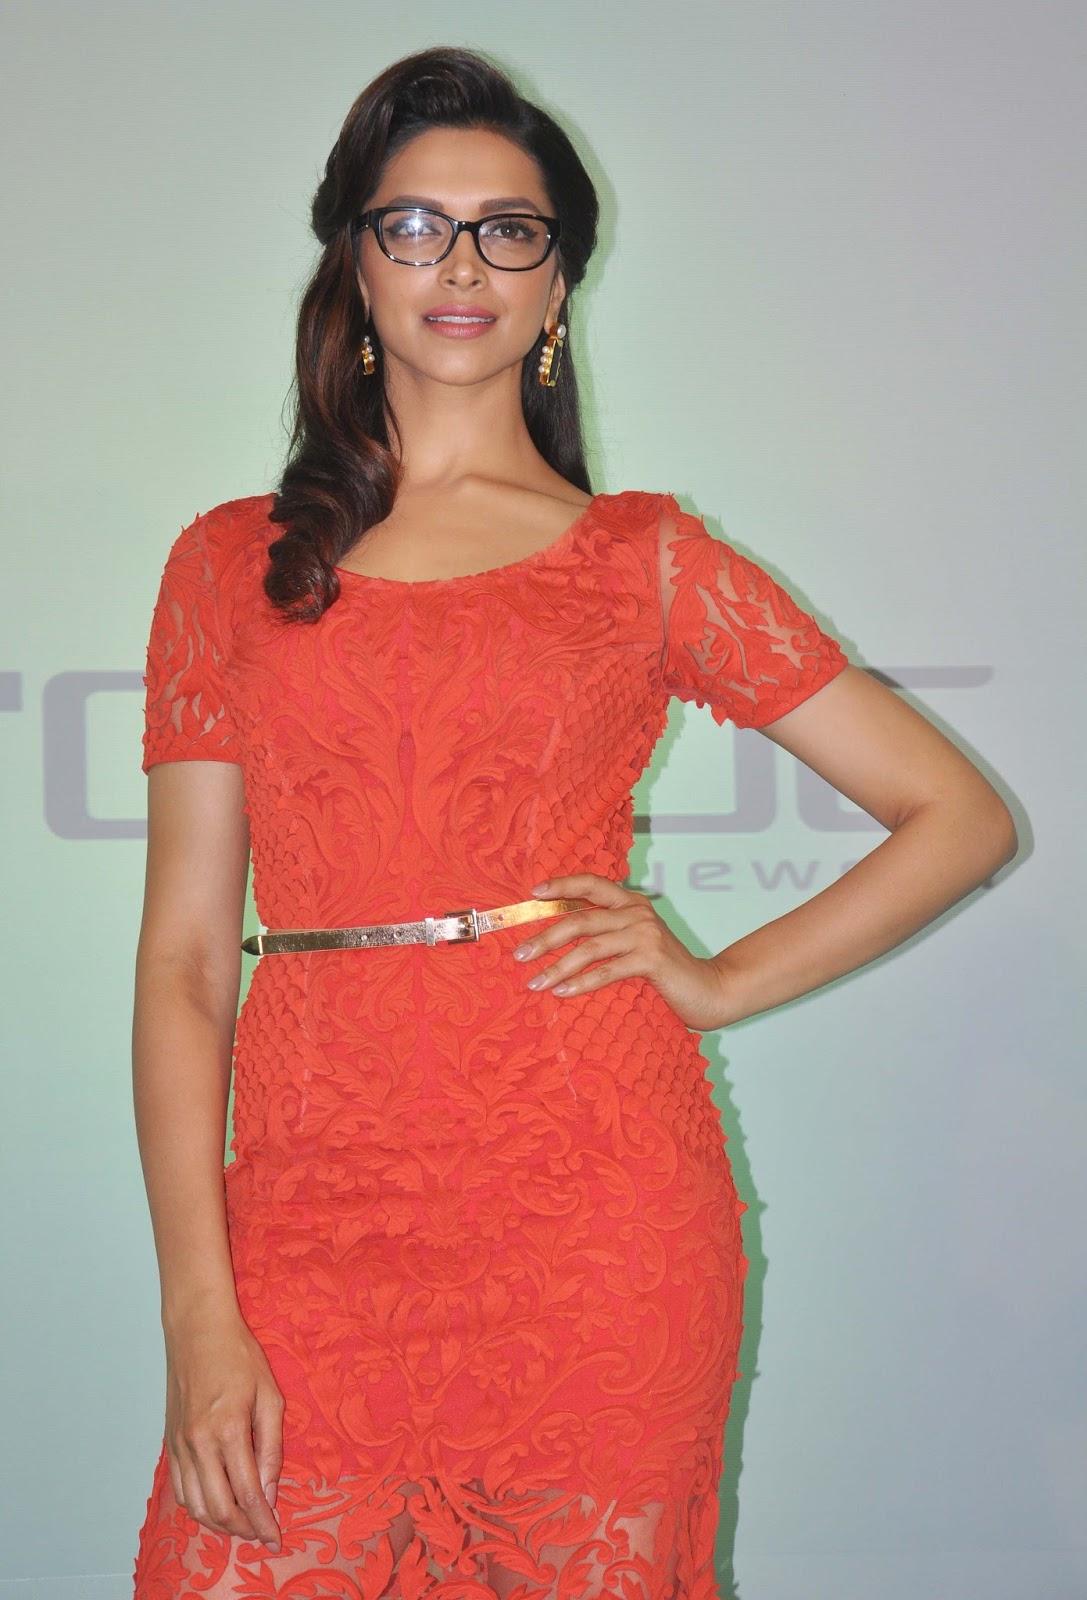 Deepika Padukone Photos In Orange Dress With Glass